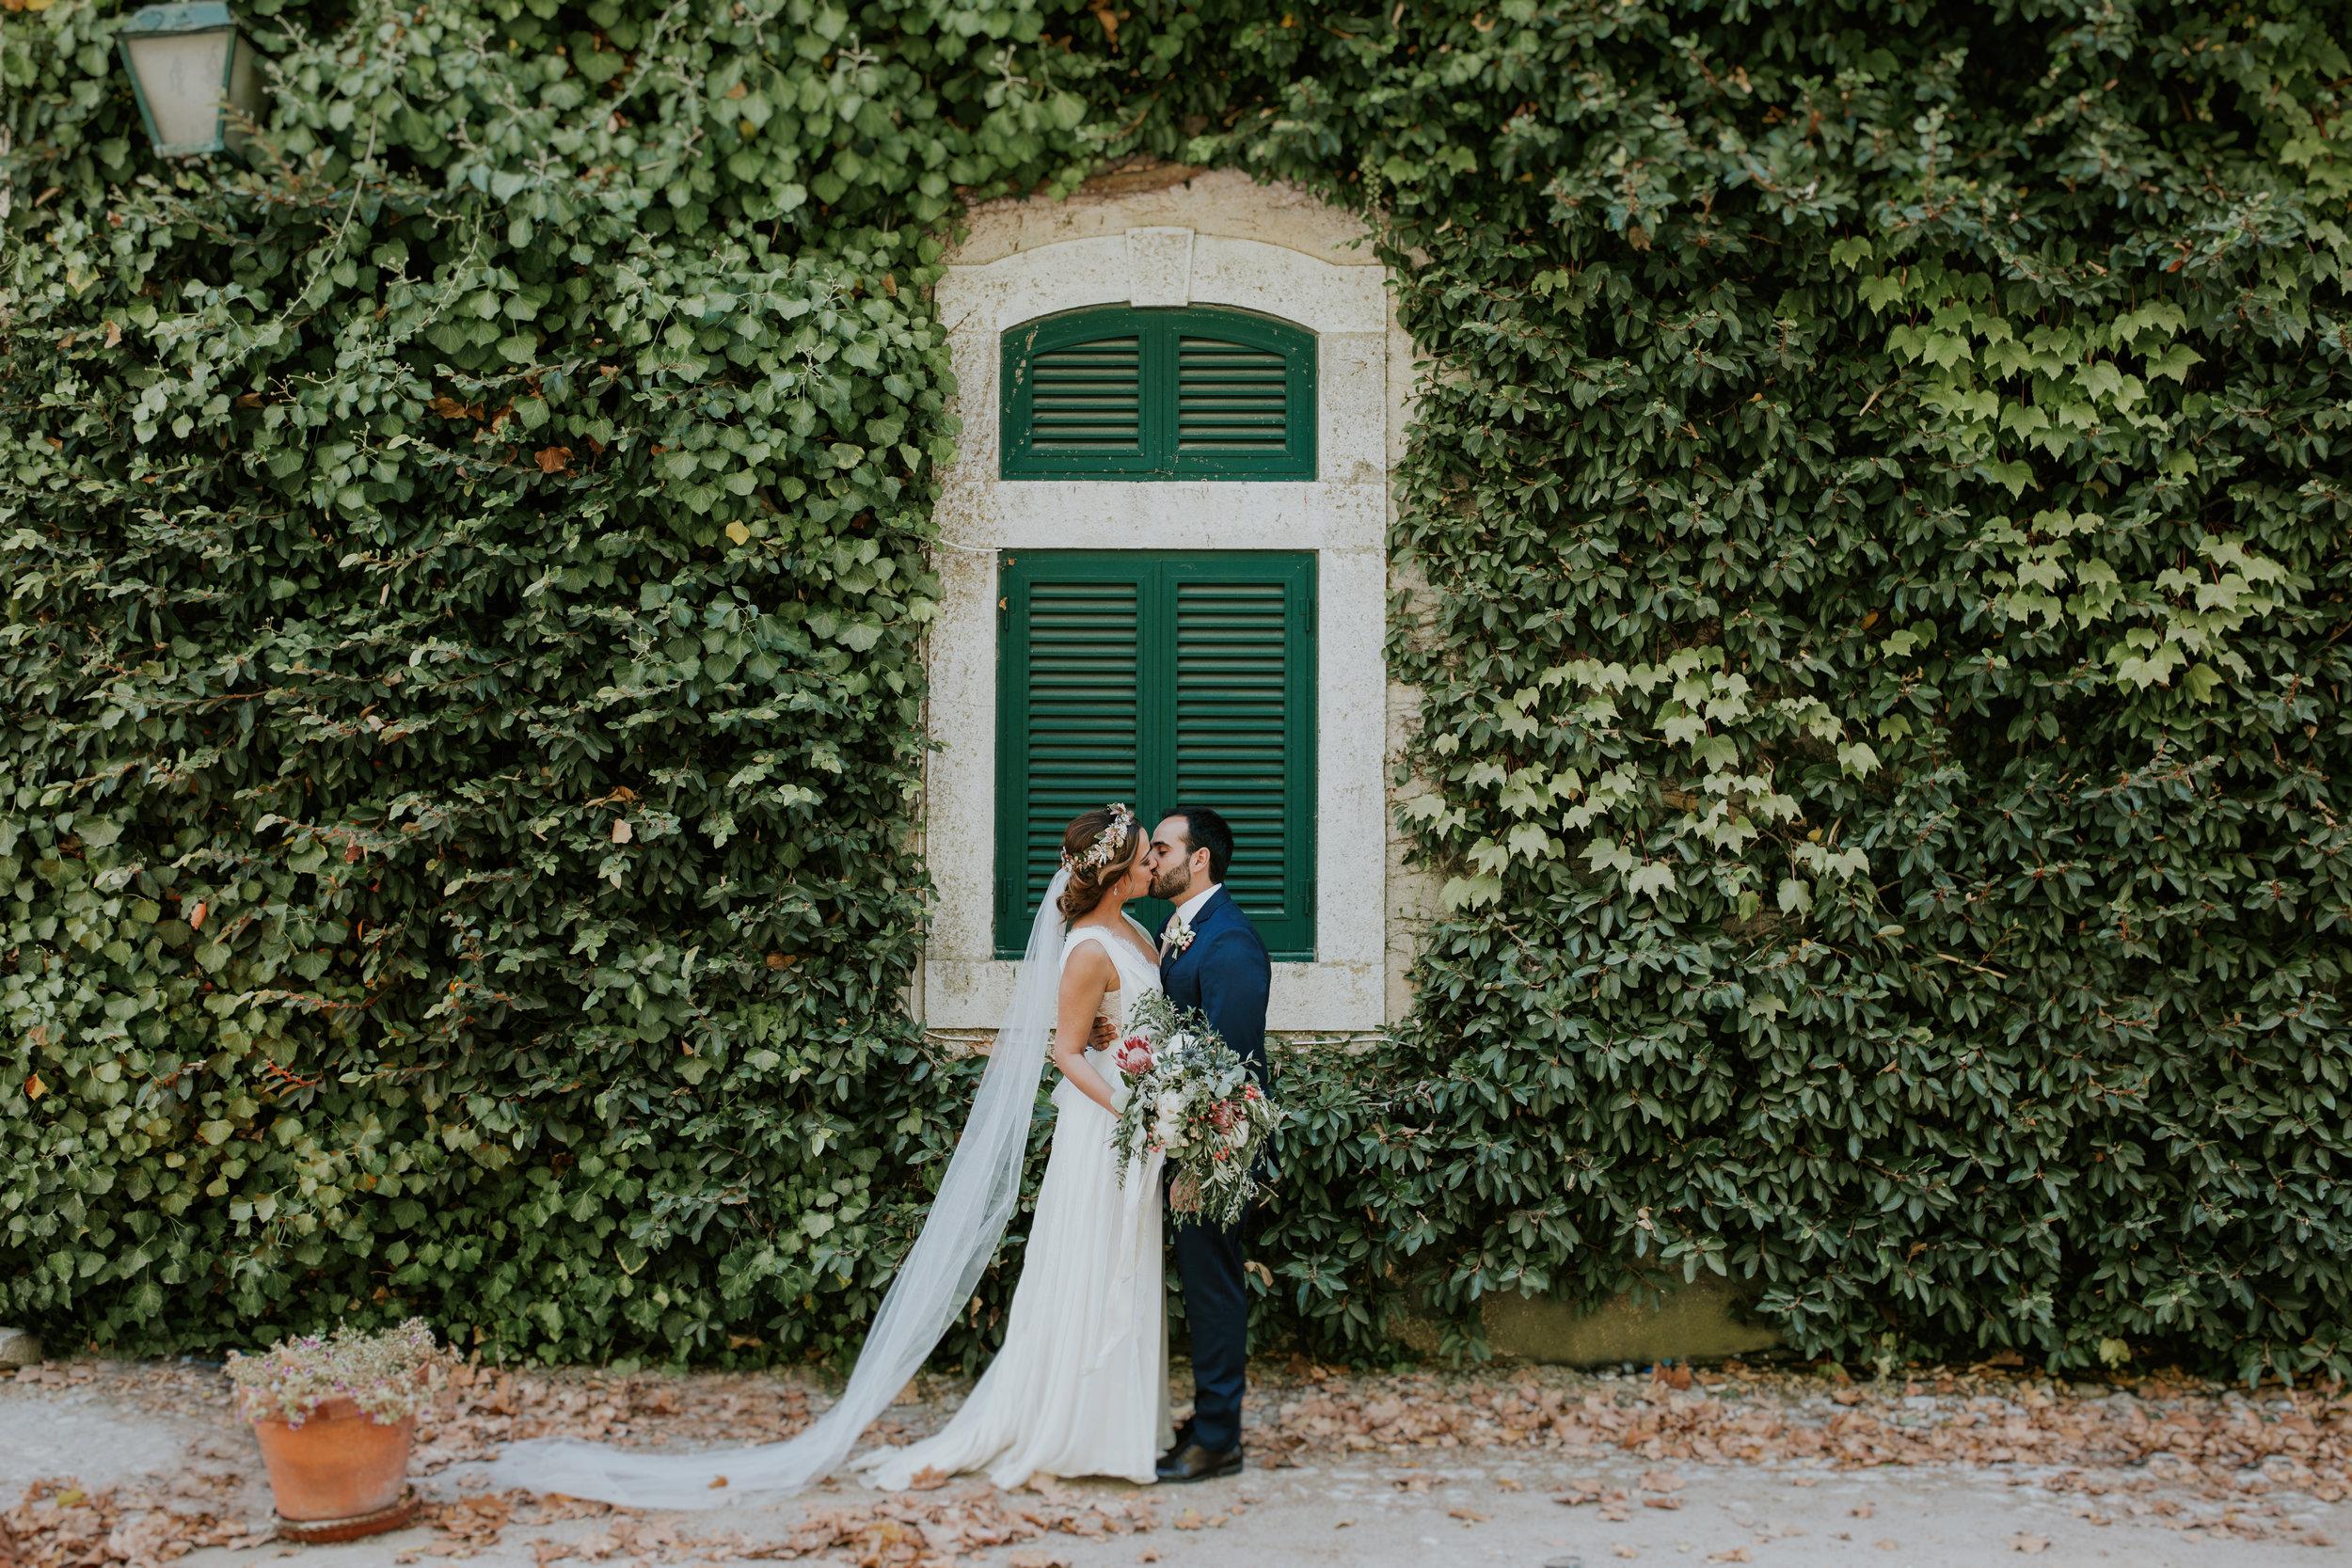 R&J395_ 09 setembro 2017 Wedding day_.jpg